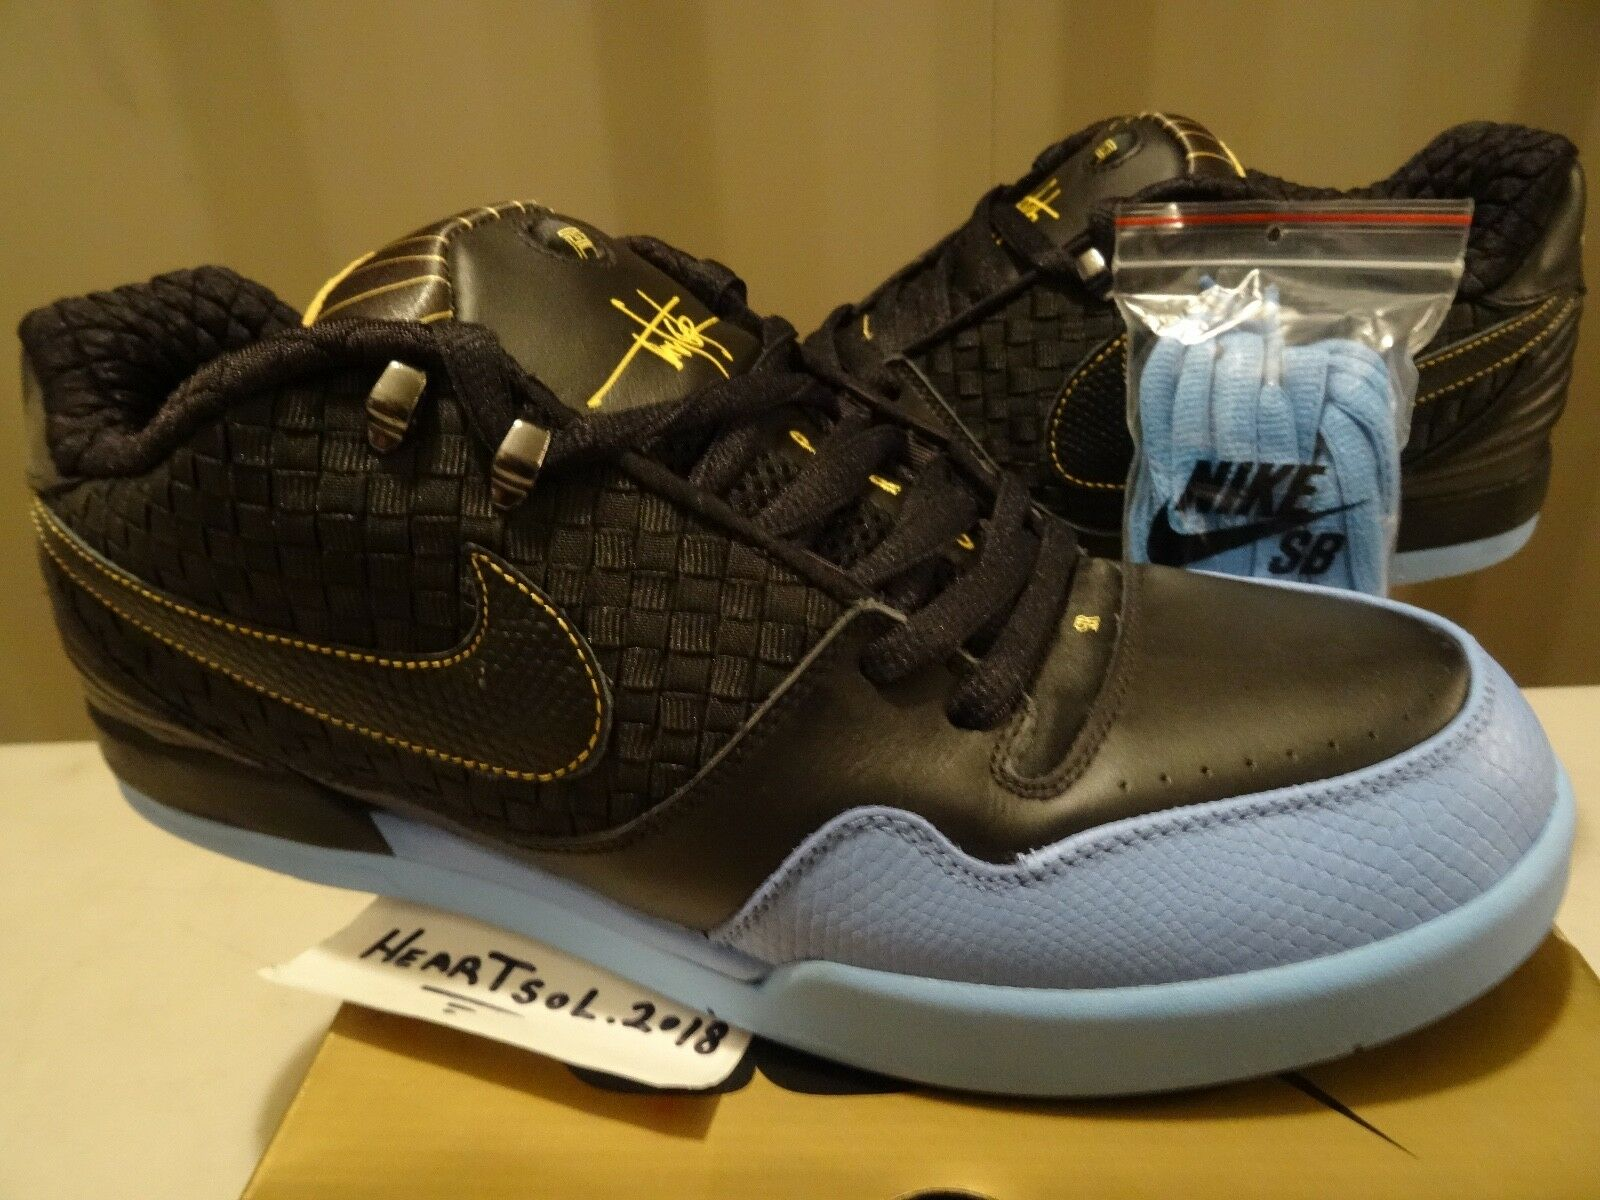 NEW Nike Dunk SB Hat Rod Tinker Hatfield P-Rod 318401-041 Paul Rodriguez SZ 6.5